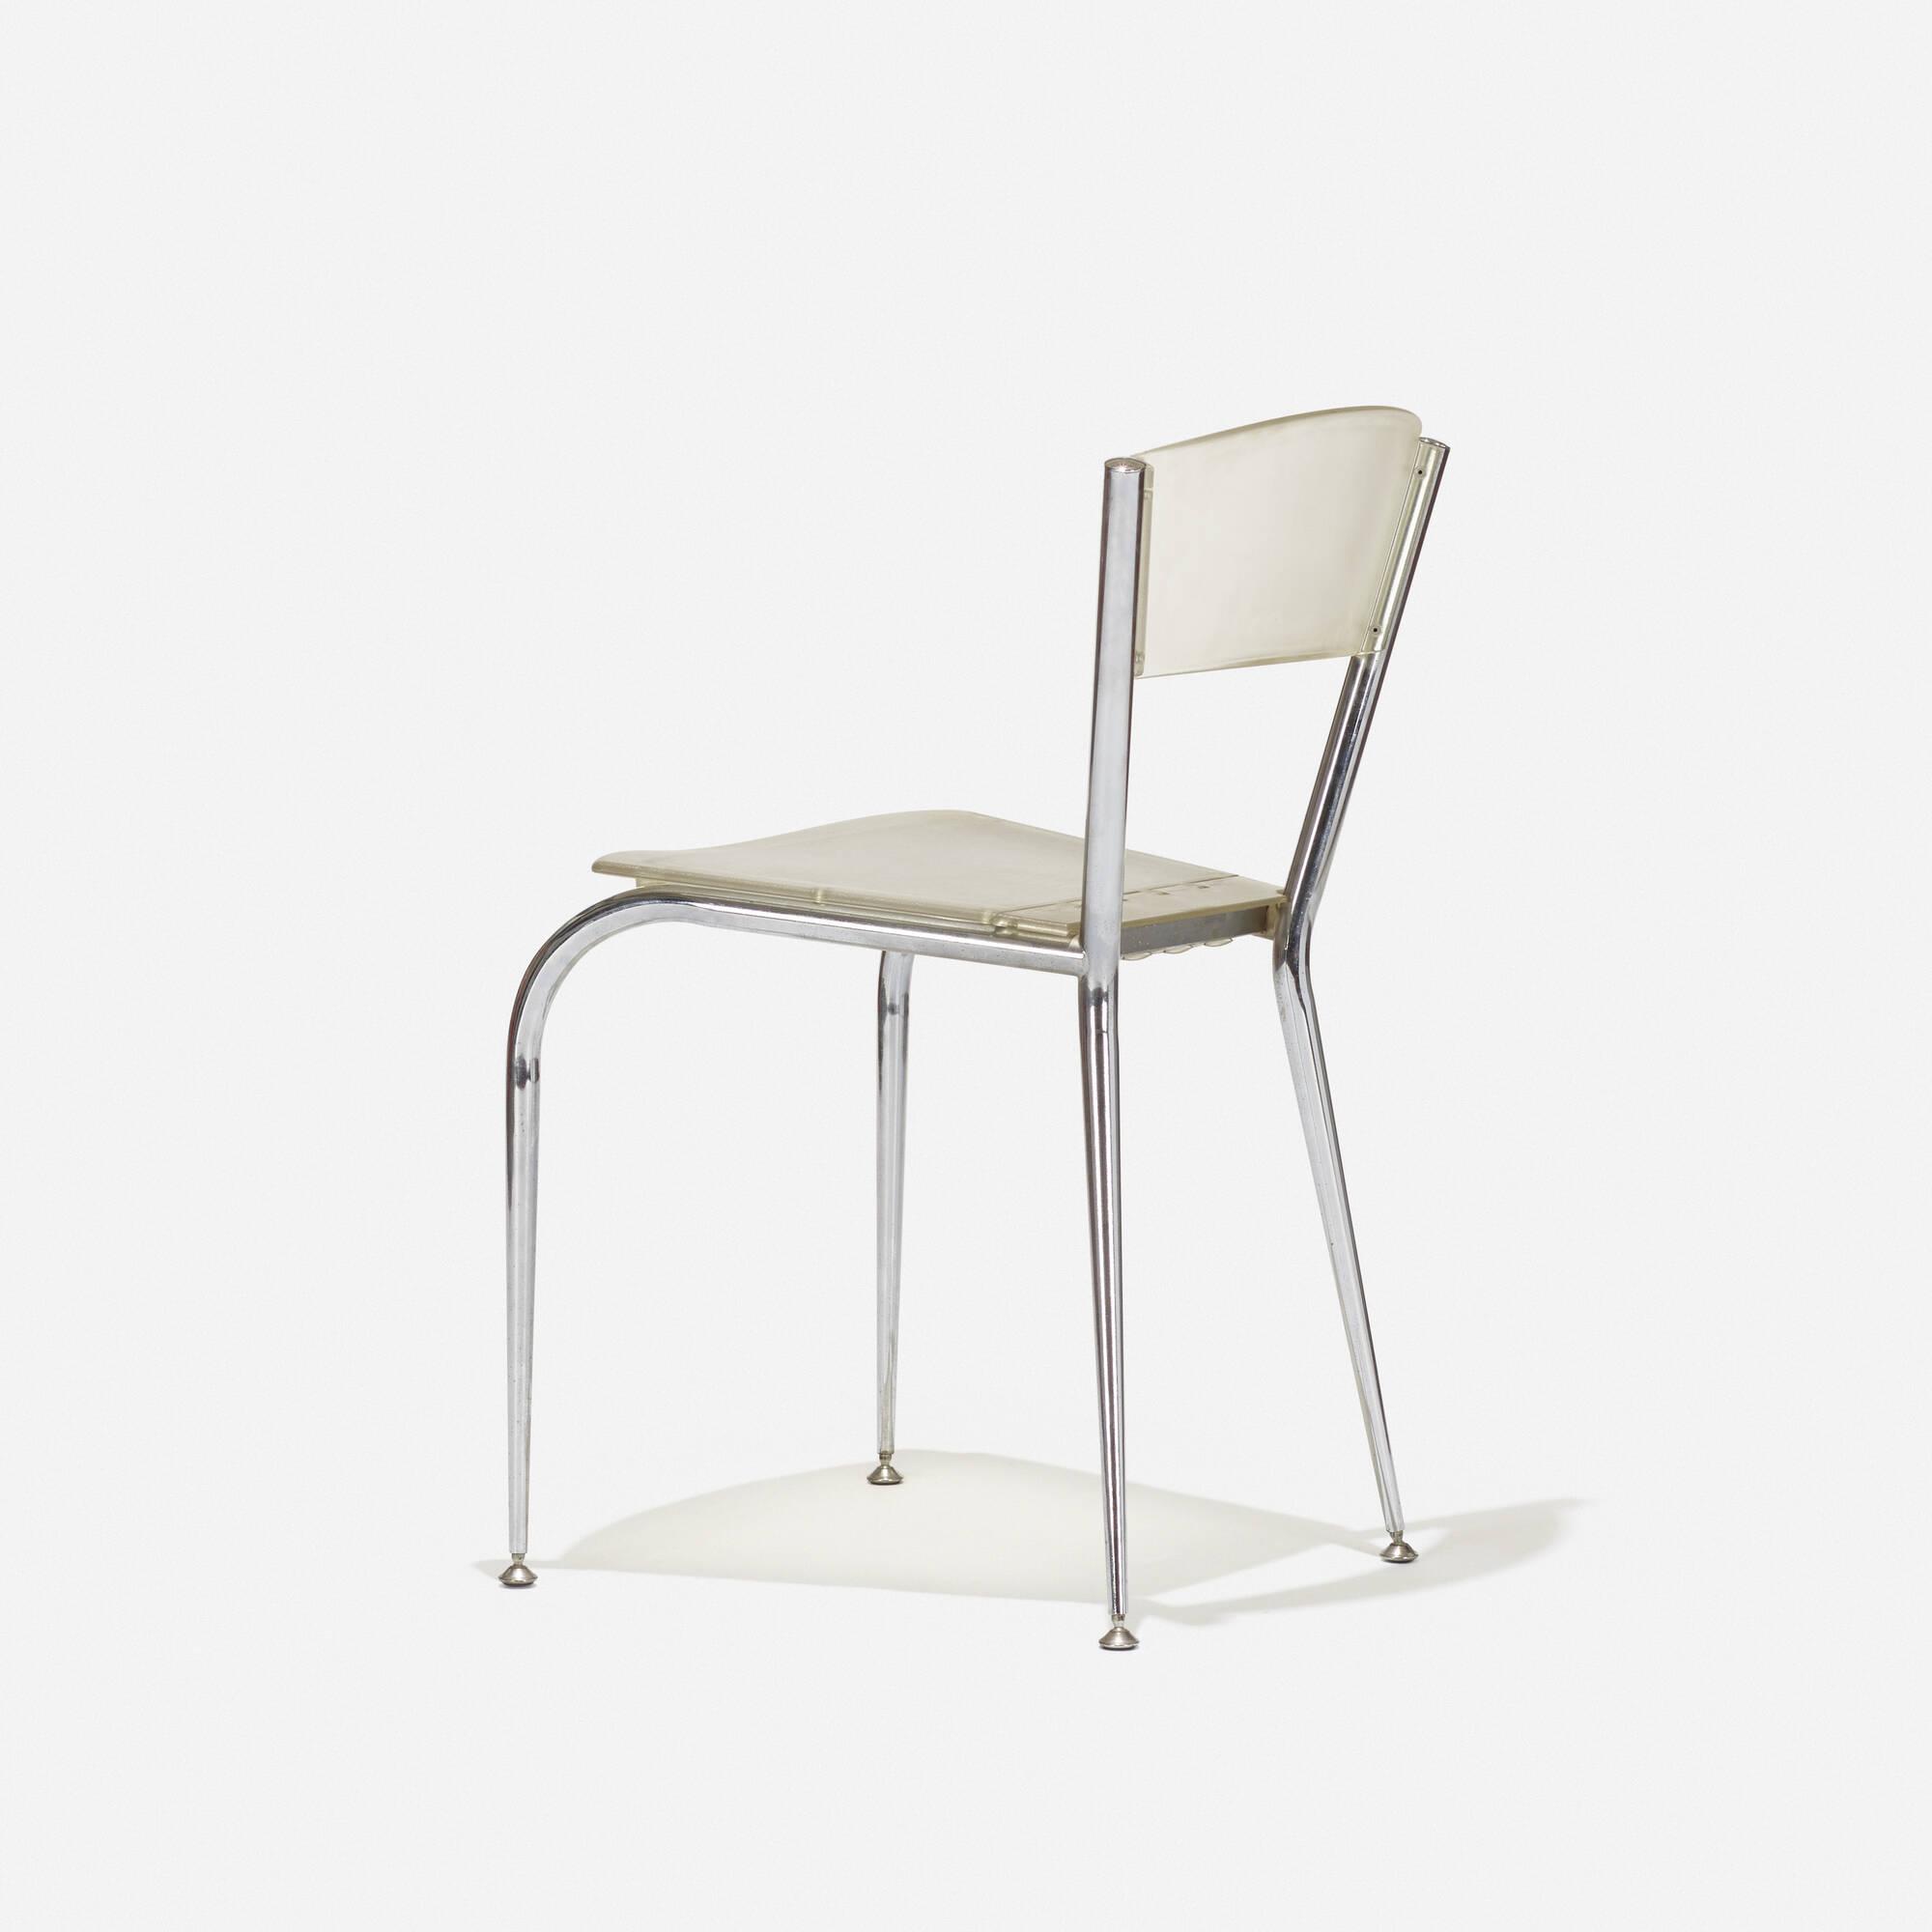 225: Enrico Baleri / Mimì chair (2 of 4)